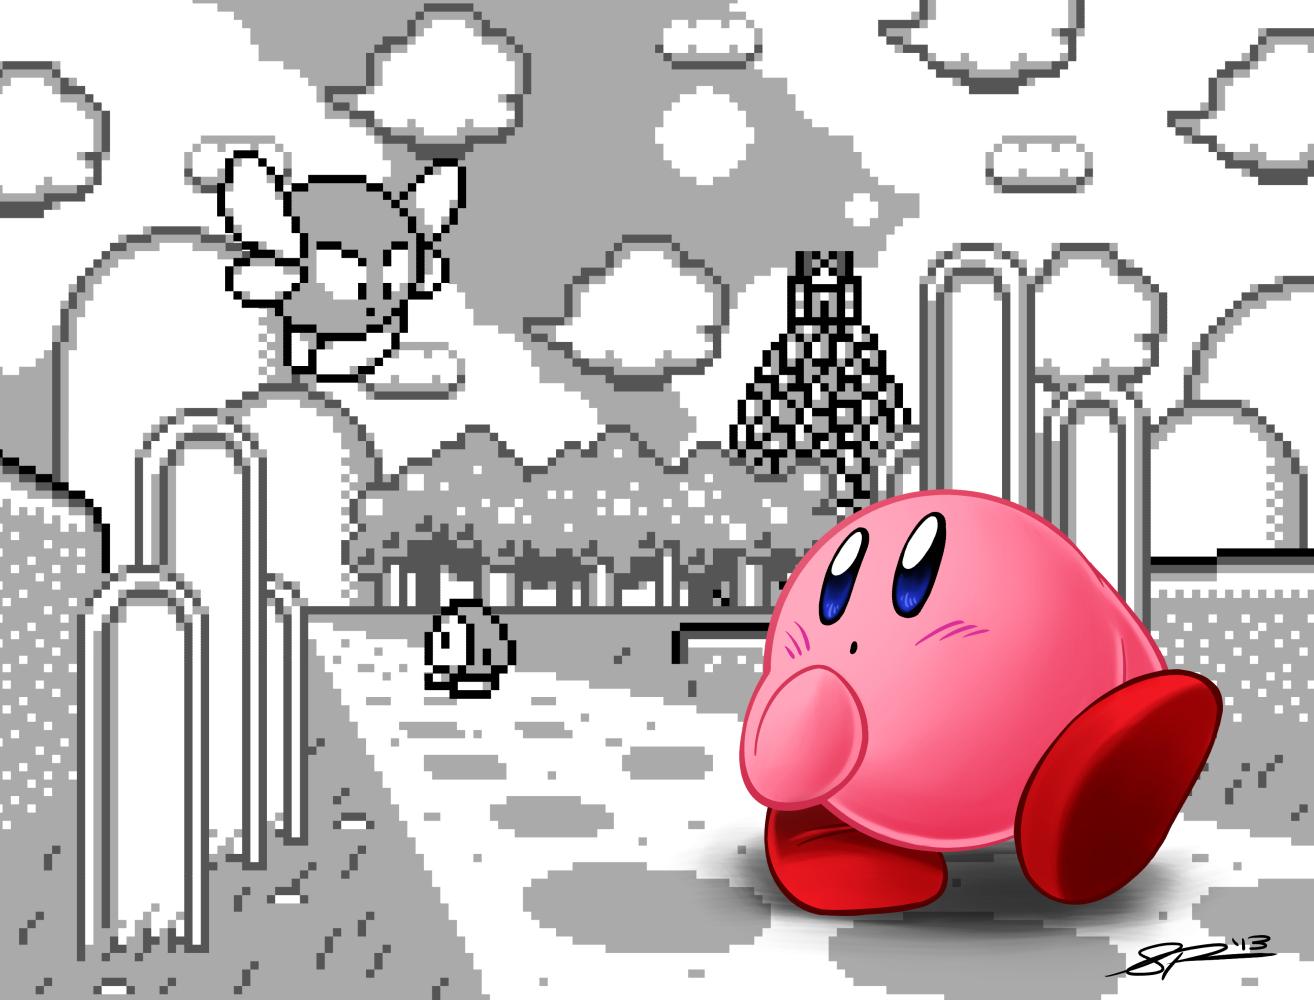 Wrong Game, Kirby